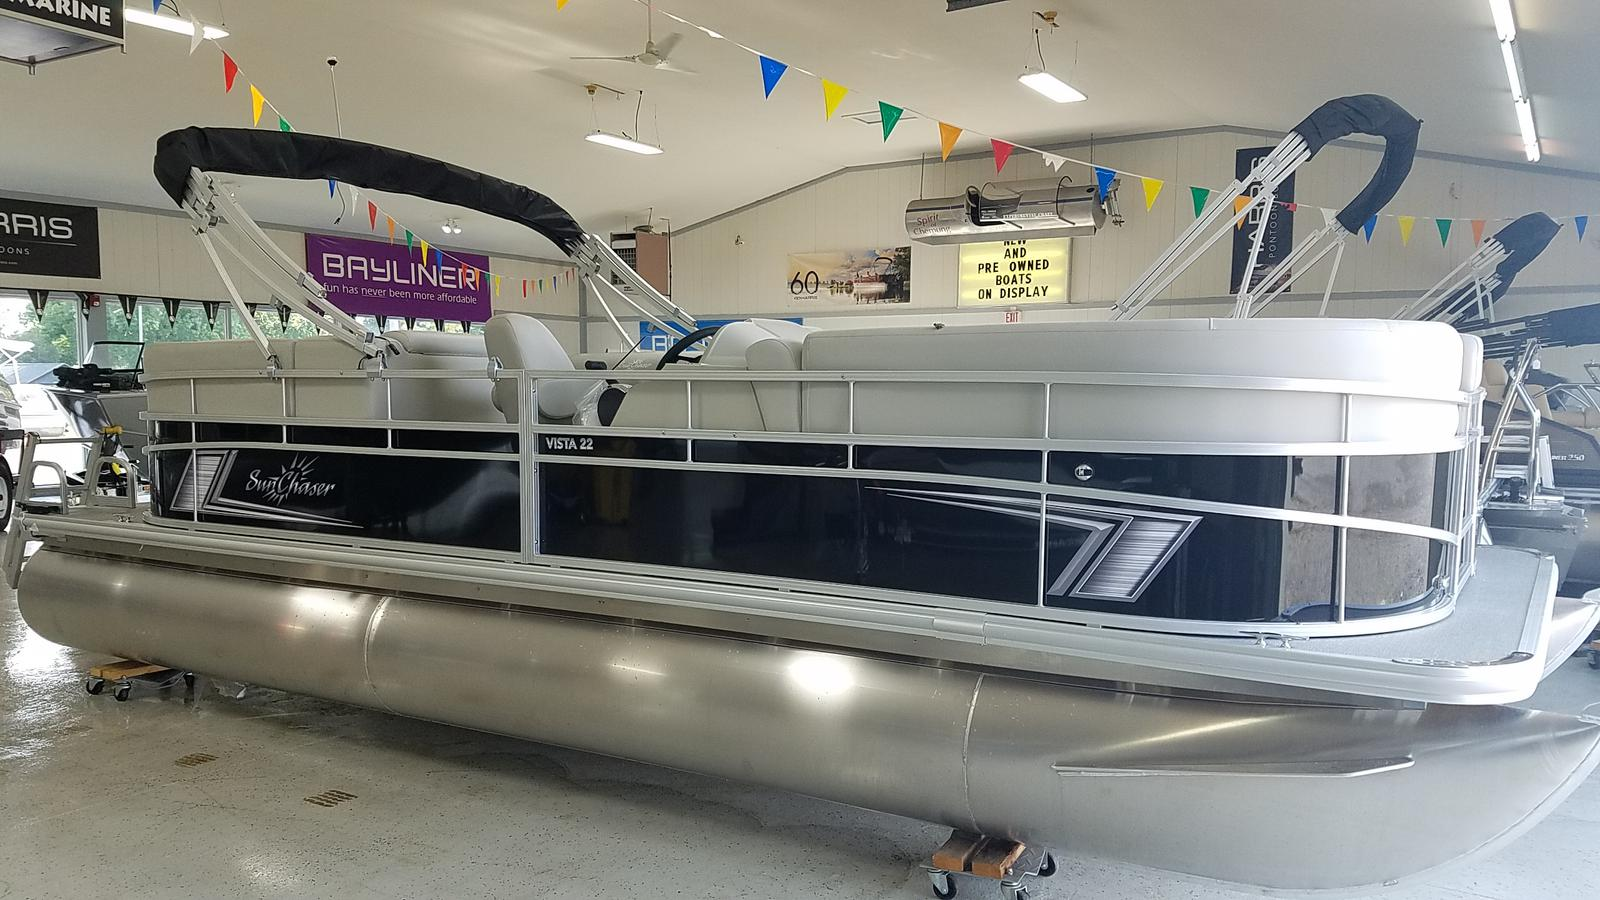 2021 SunChaser boat for sale, model of the boat is Vista 22 LR & Image # 1 of 7